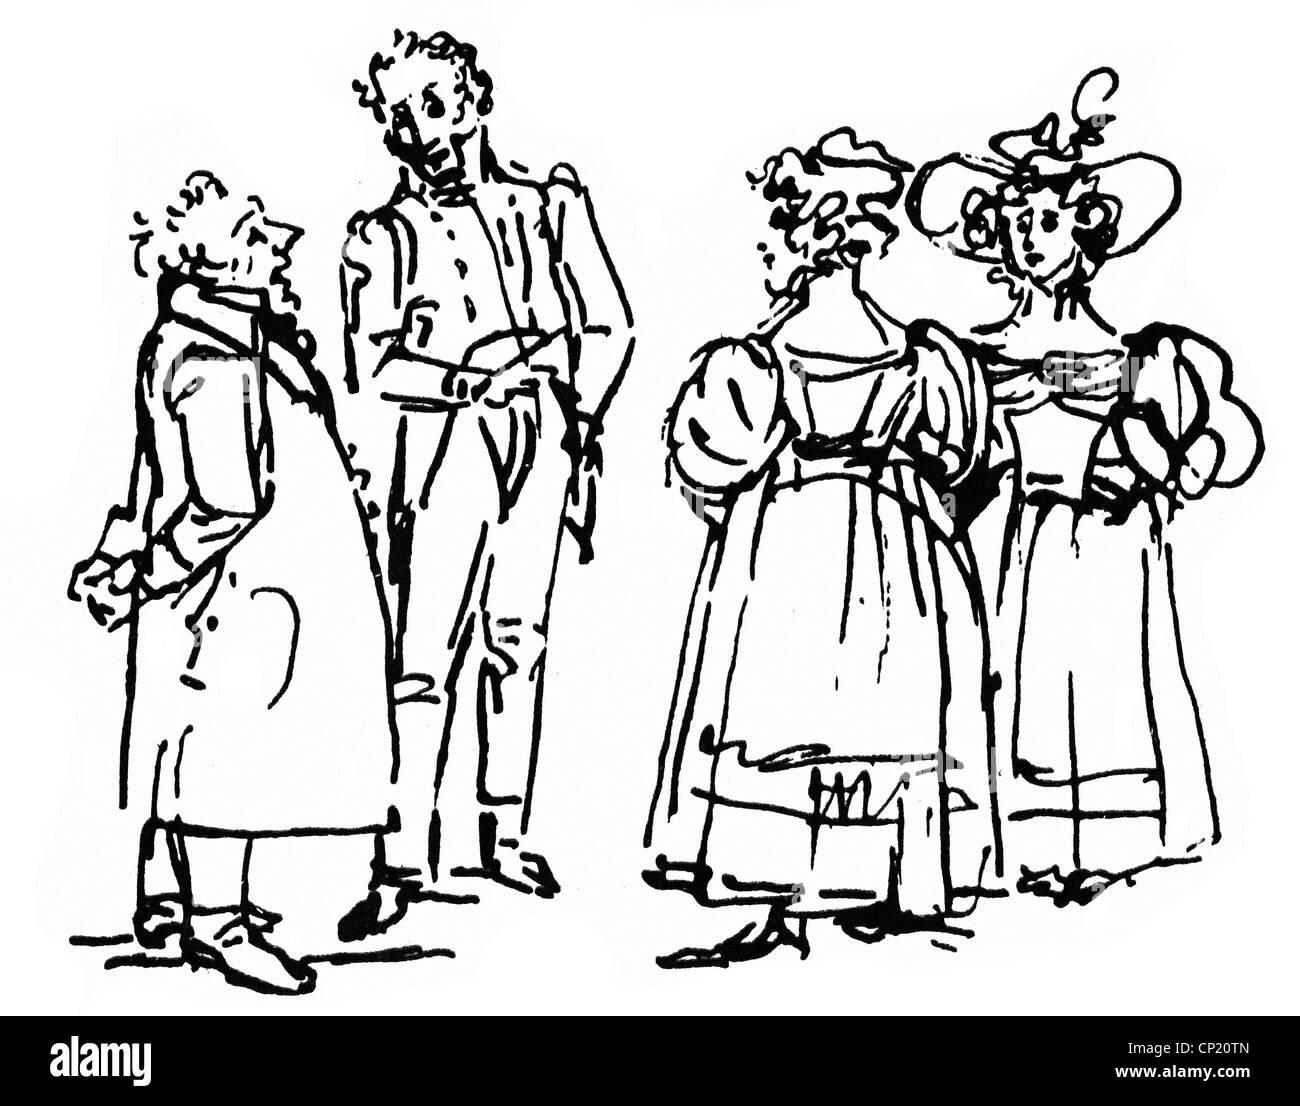 Schadow, Johann Gottfried, 20.5.1764 - 27.1.1850, scultore e grafico tedesco, opere, mostre d'arte, scetch, drawing, circa 1835, Foto Stock